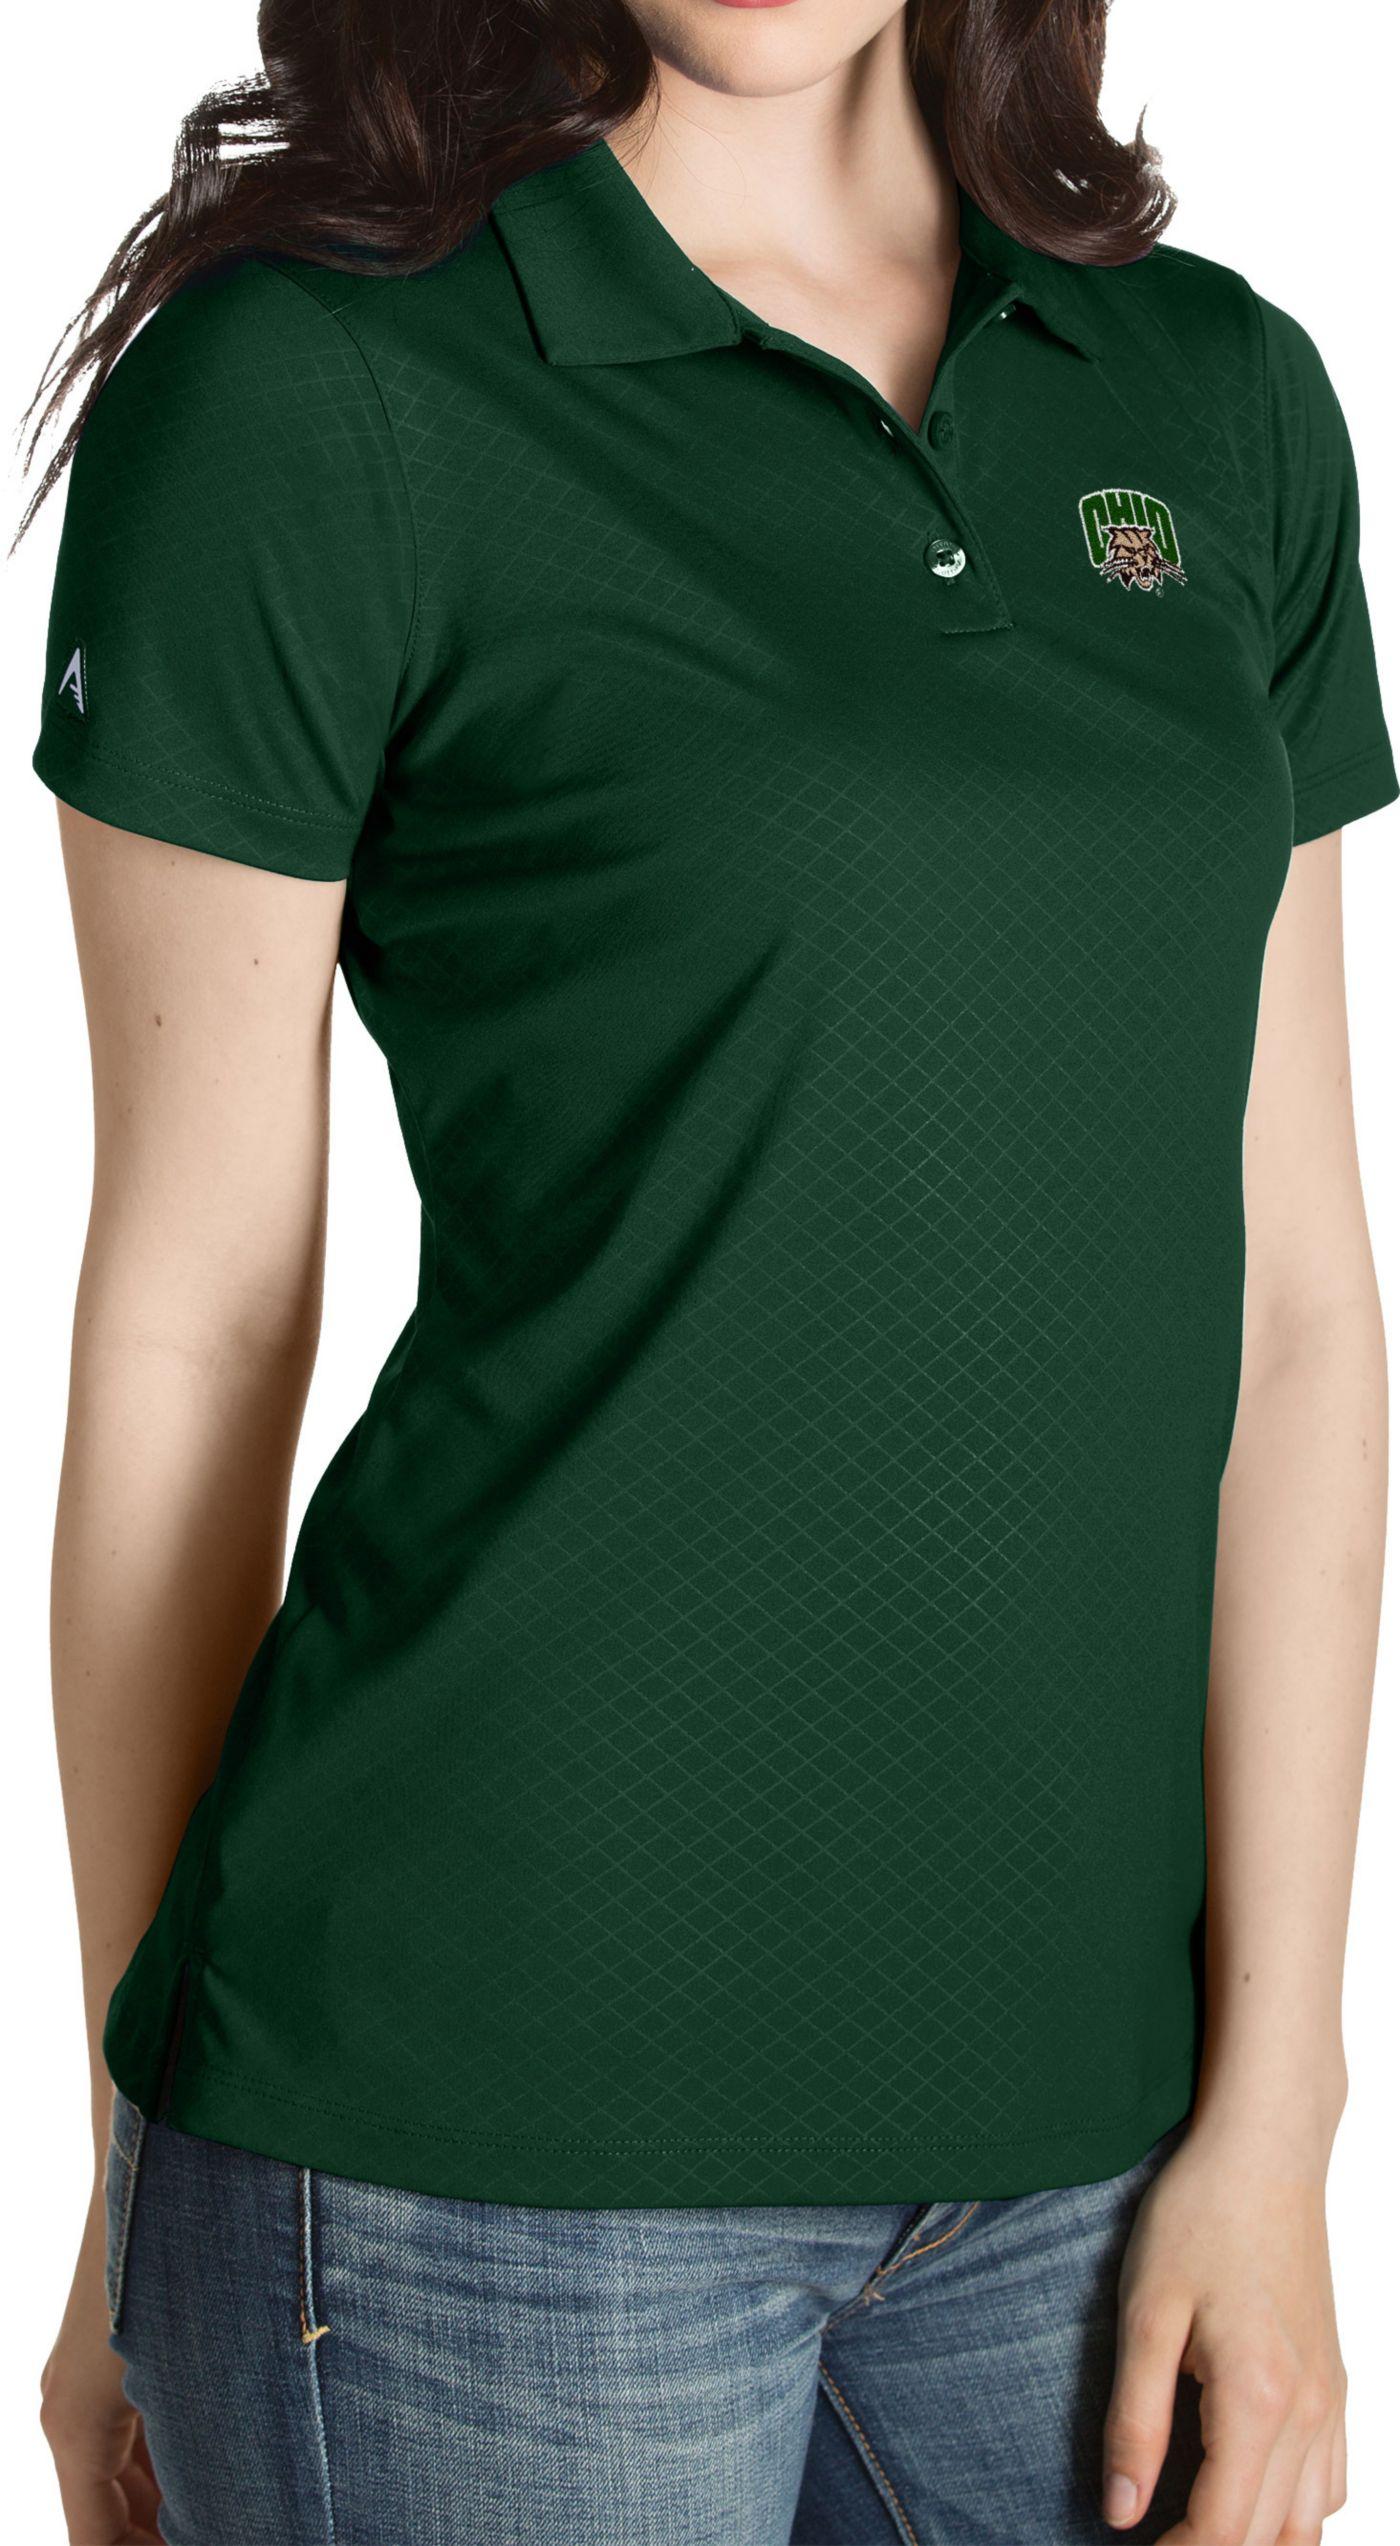 Antigua Women's Ohio Bobcats Green Inspire Performance Polo